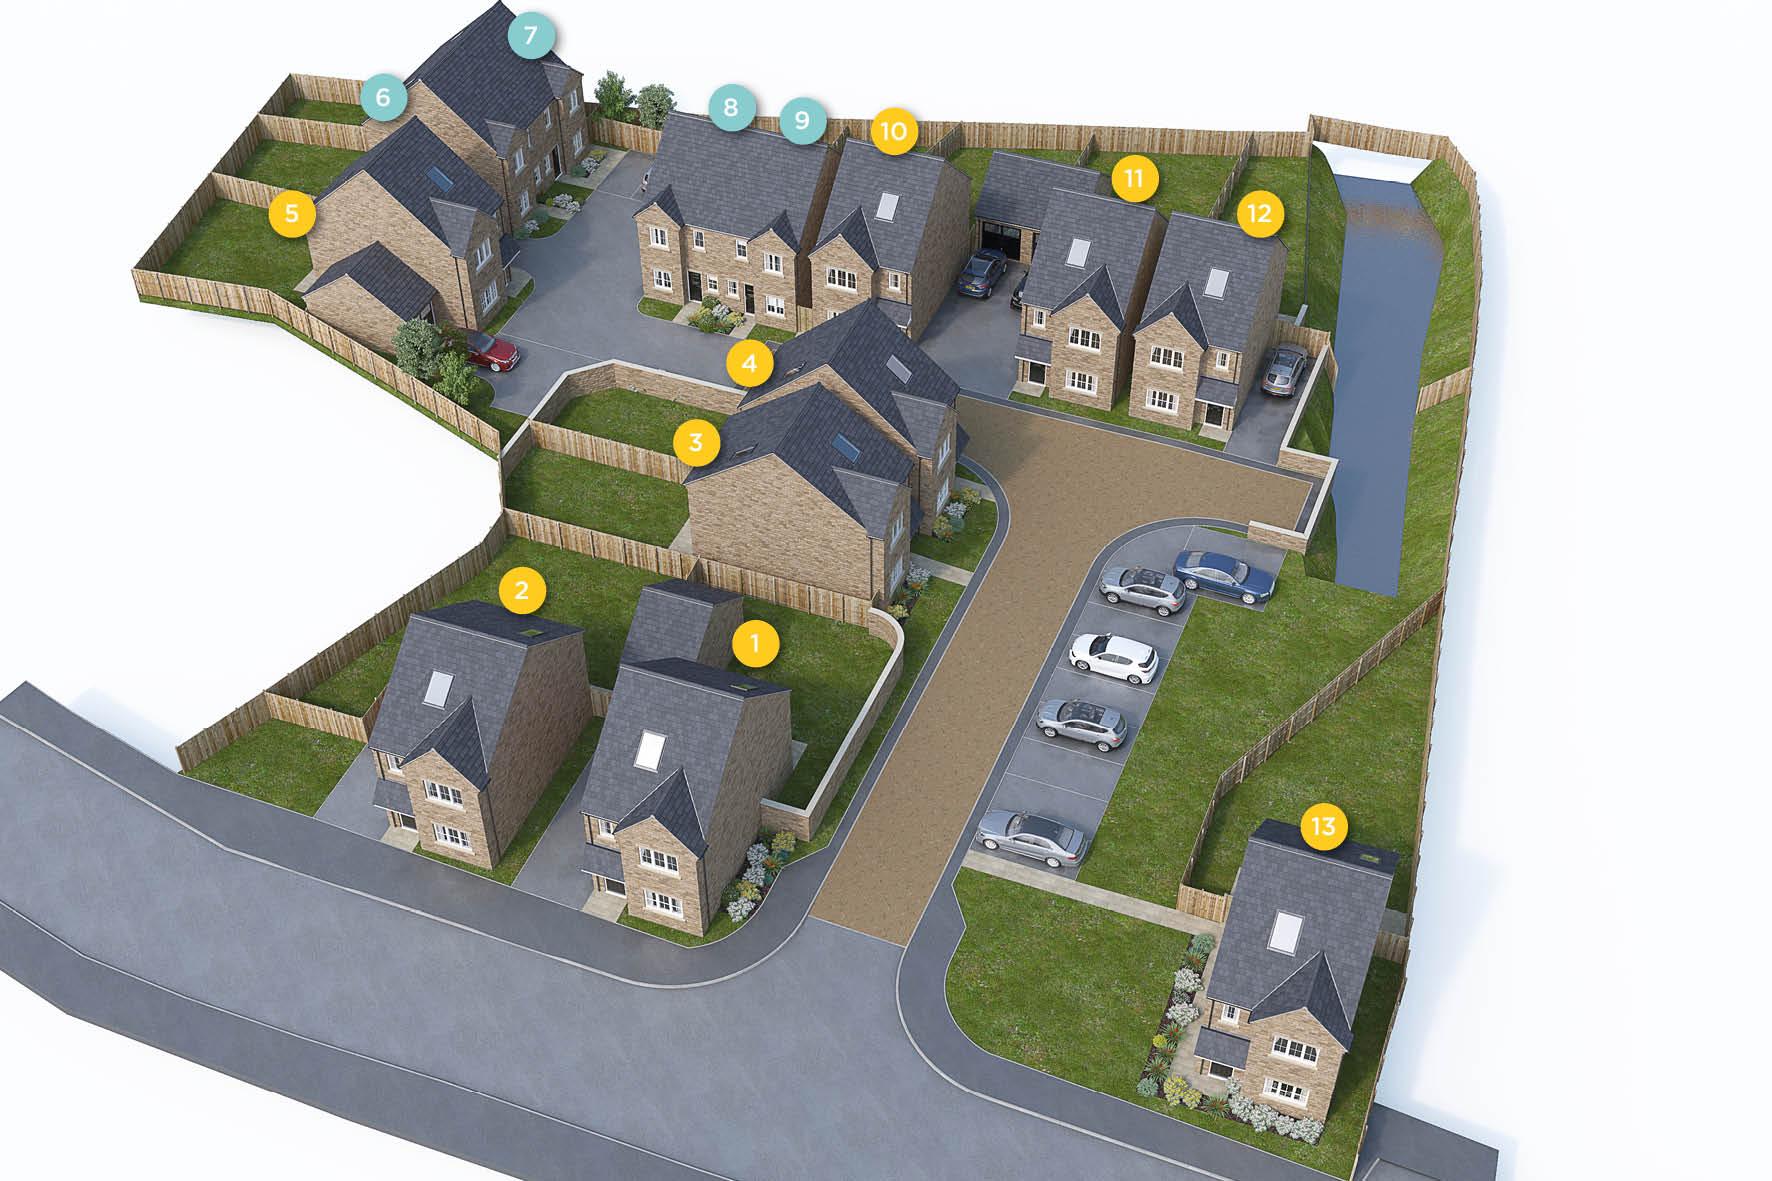 buckingham_green_site_plan.jpg